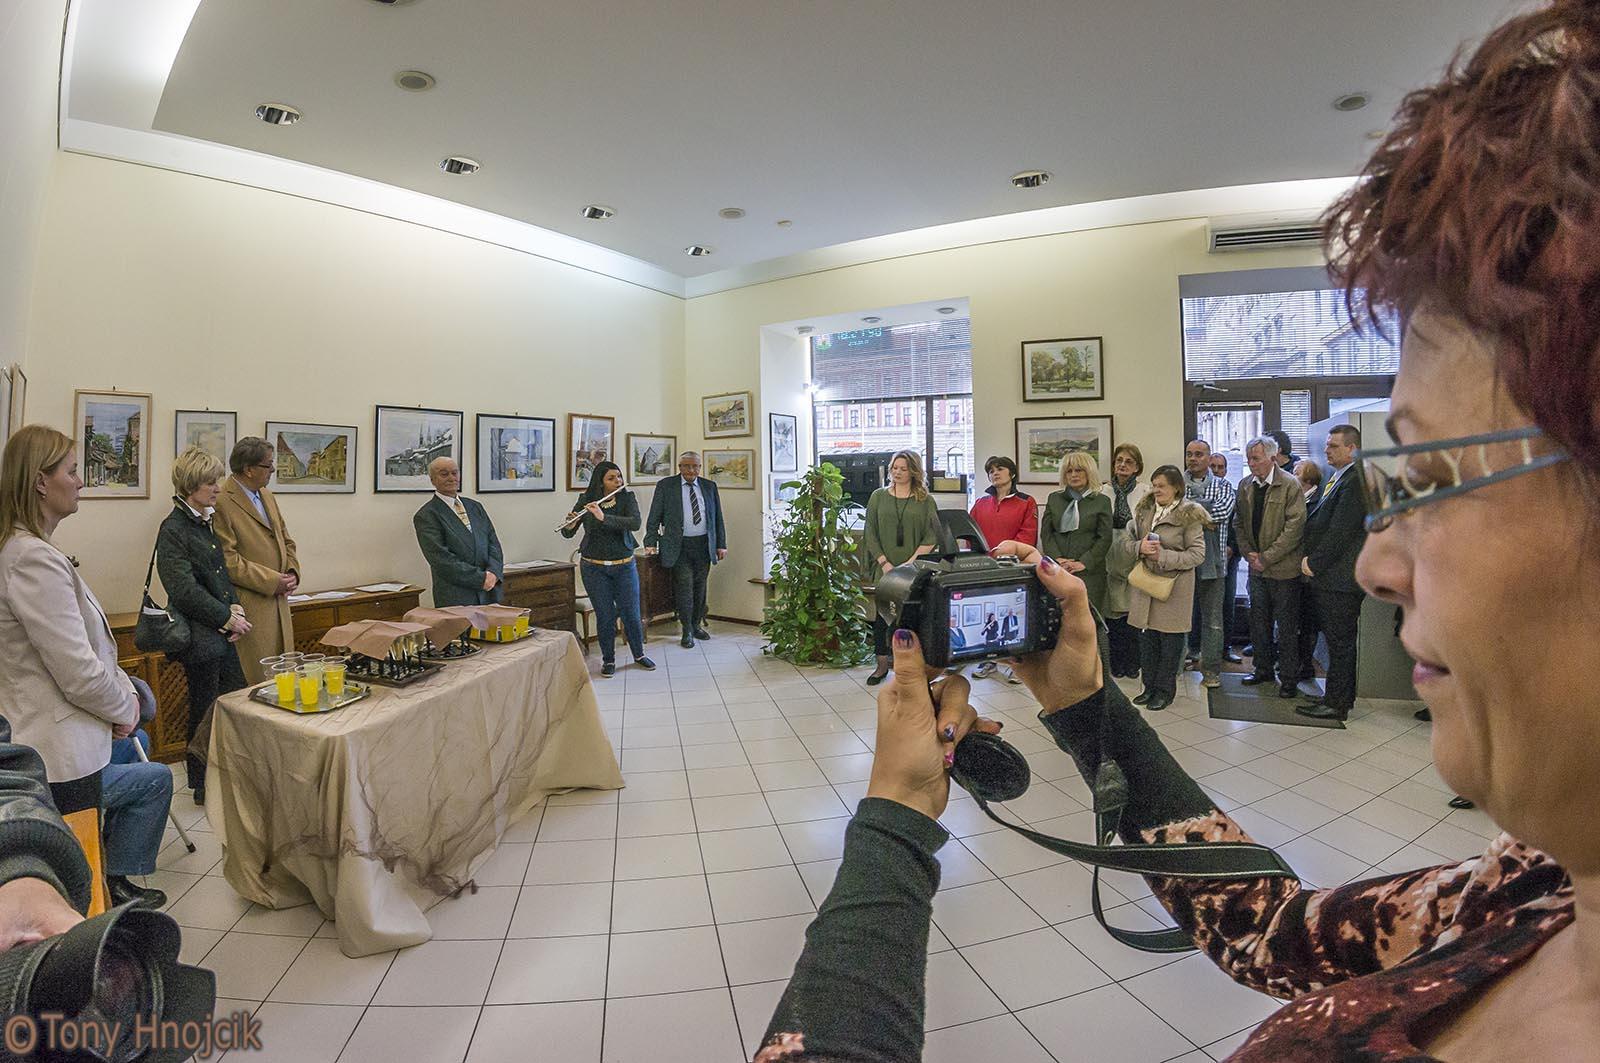 Sa Izlozbe Slika Stari Zagreb I Hrvatski Krajolici Dr Nikole Grozdanovskog - Kolea (18)